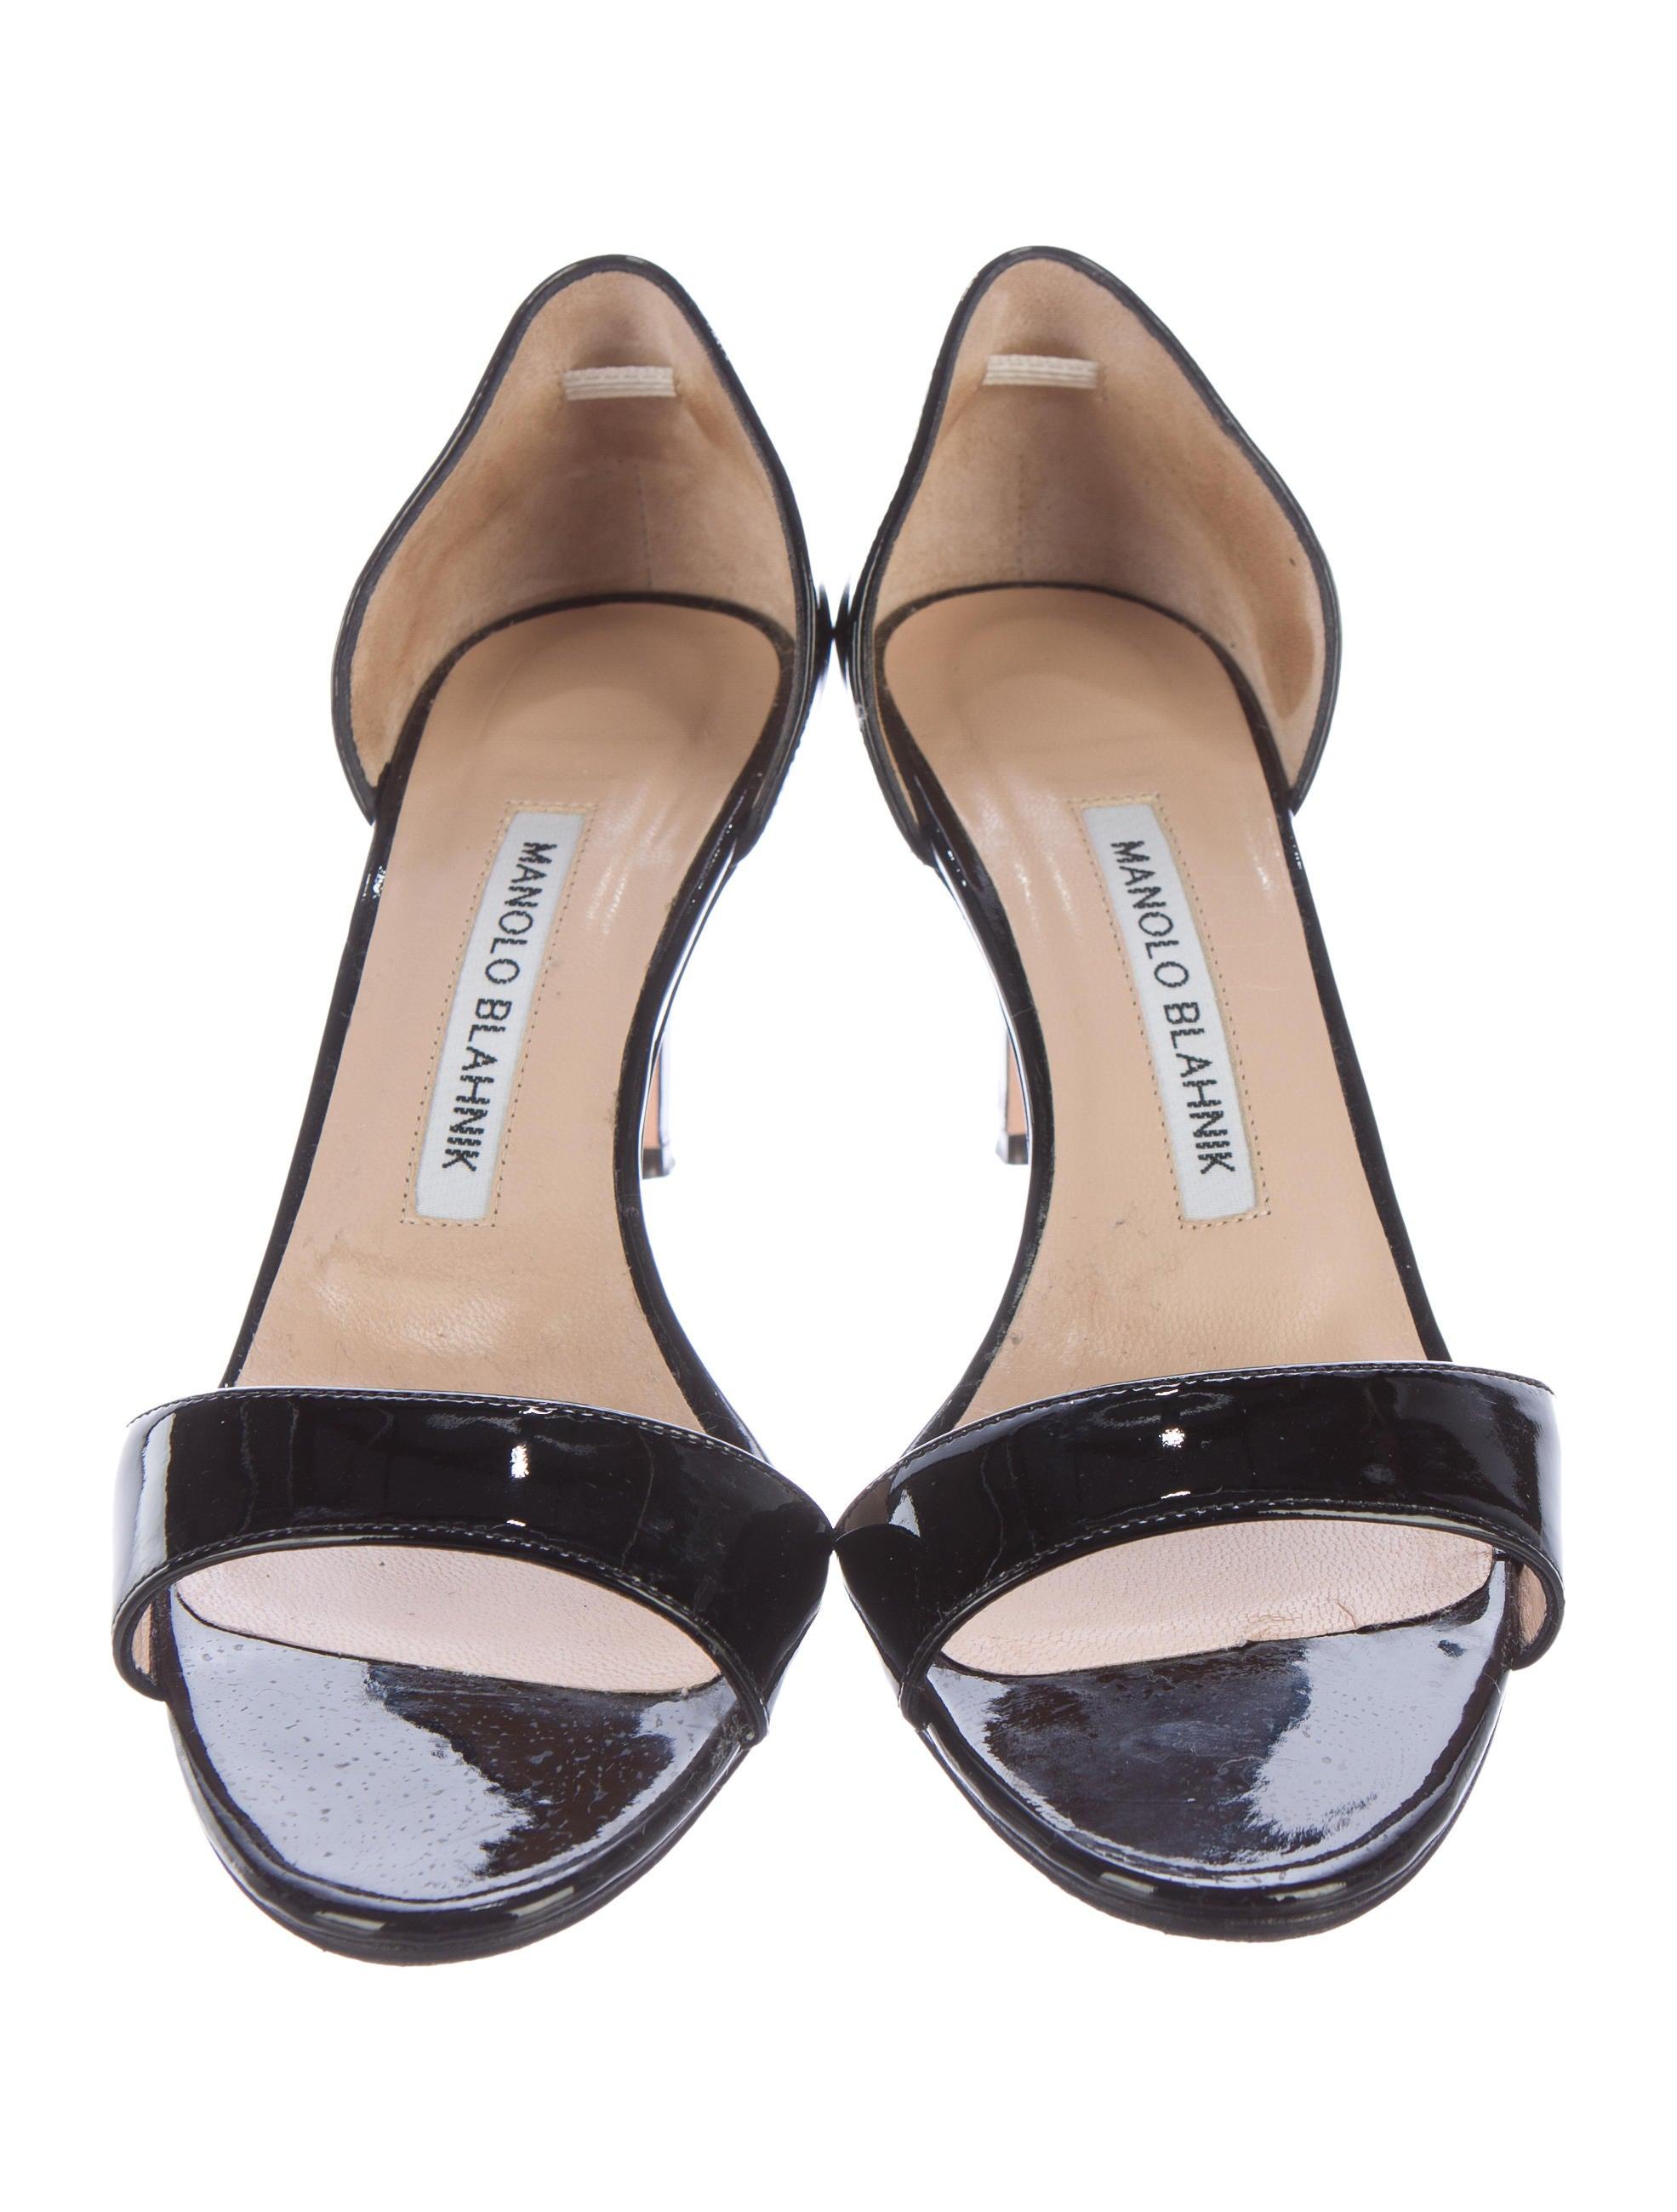 Manolo Blahnik Patent D Orsay Sandals Shoes Moo58839